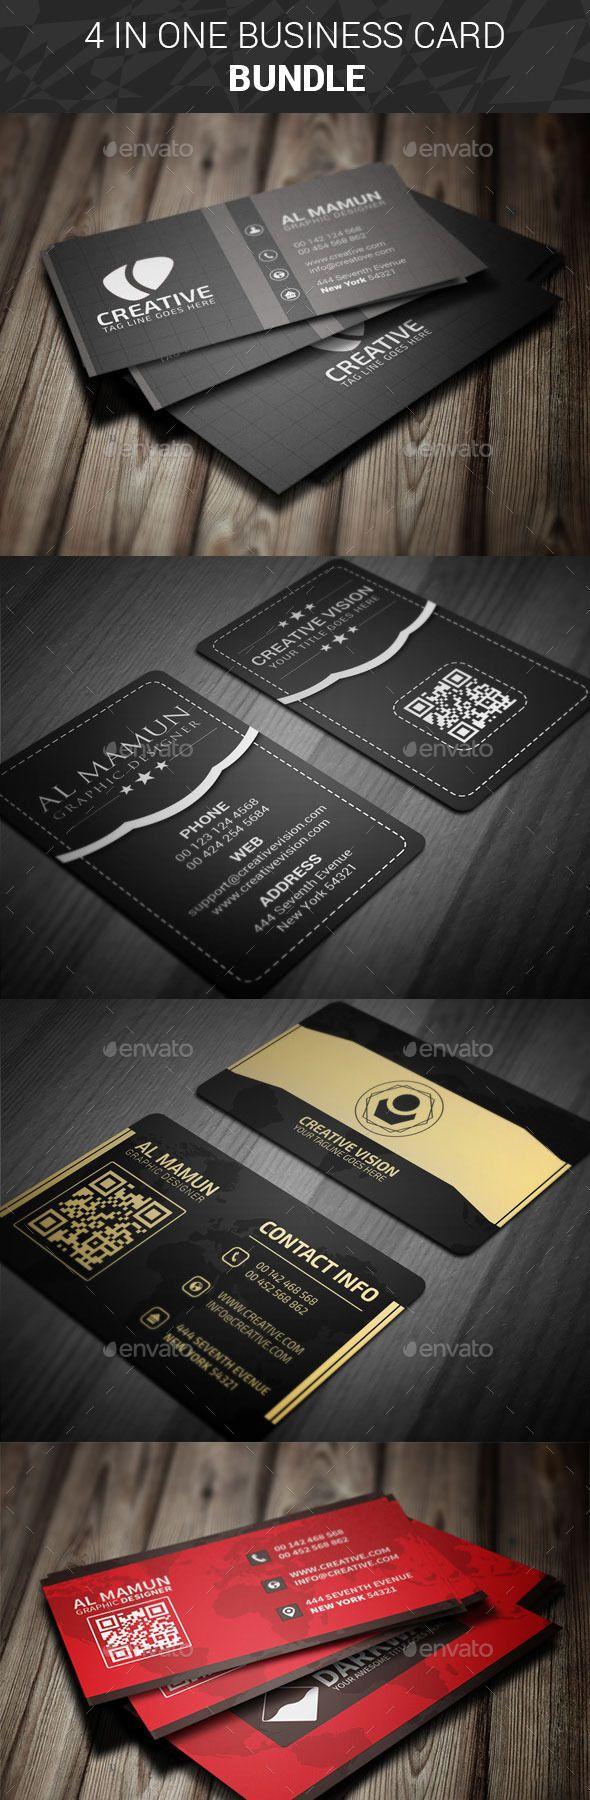 1676 best best business cards on pinterest images on pinterest business card bundle four in one colourmoves